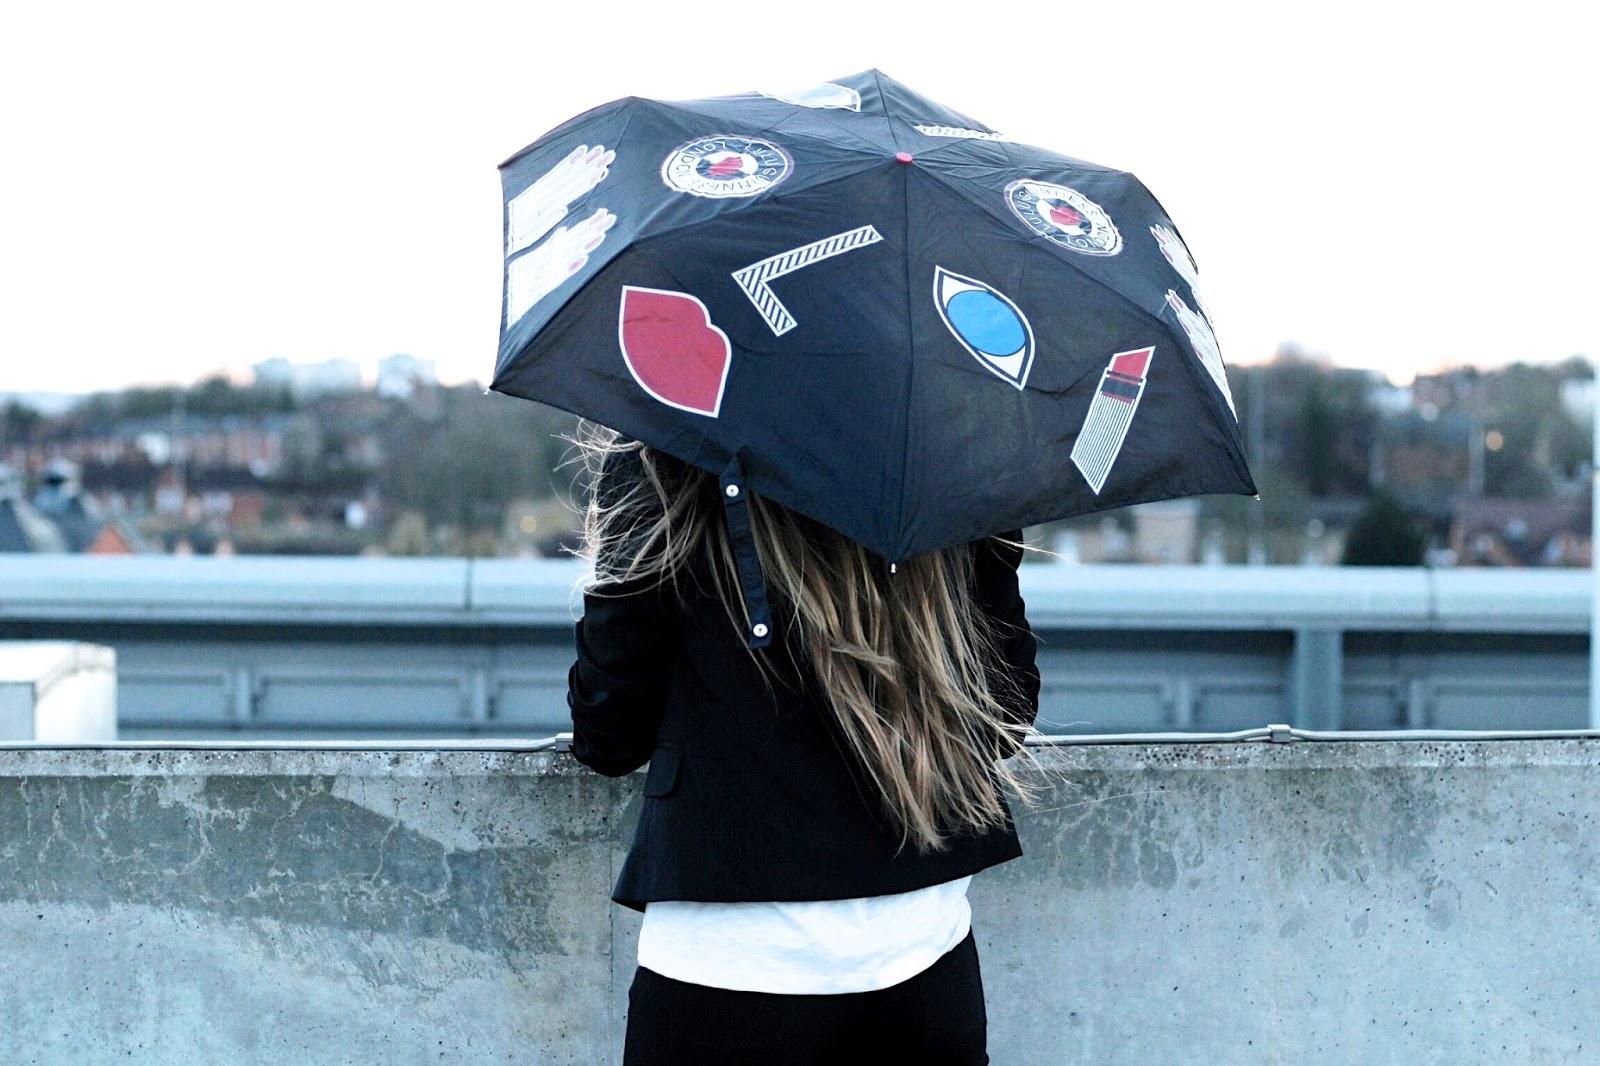 Fulton Lulu Guinness Superslim 2 Stickers Umbrella